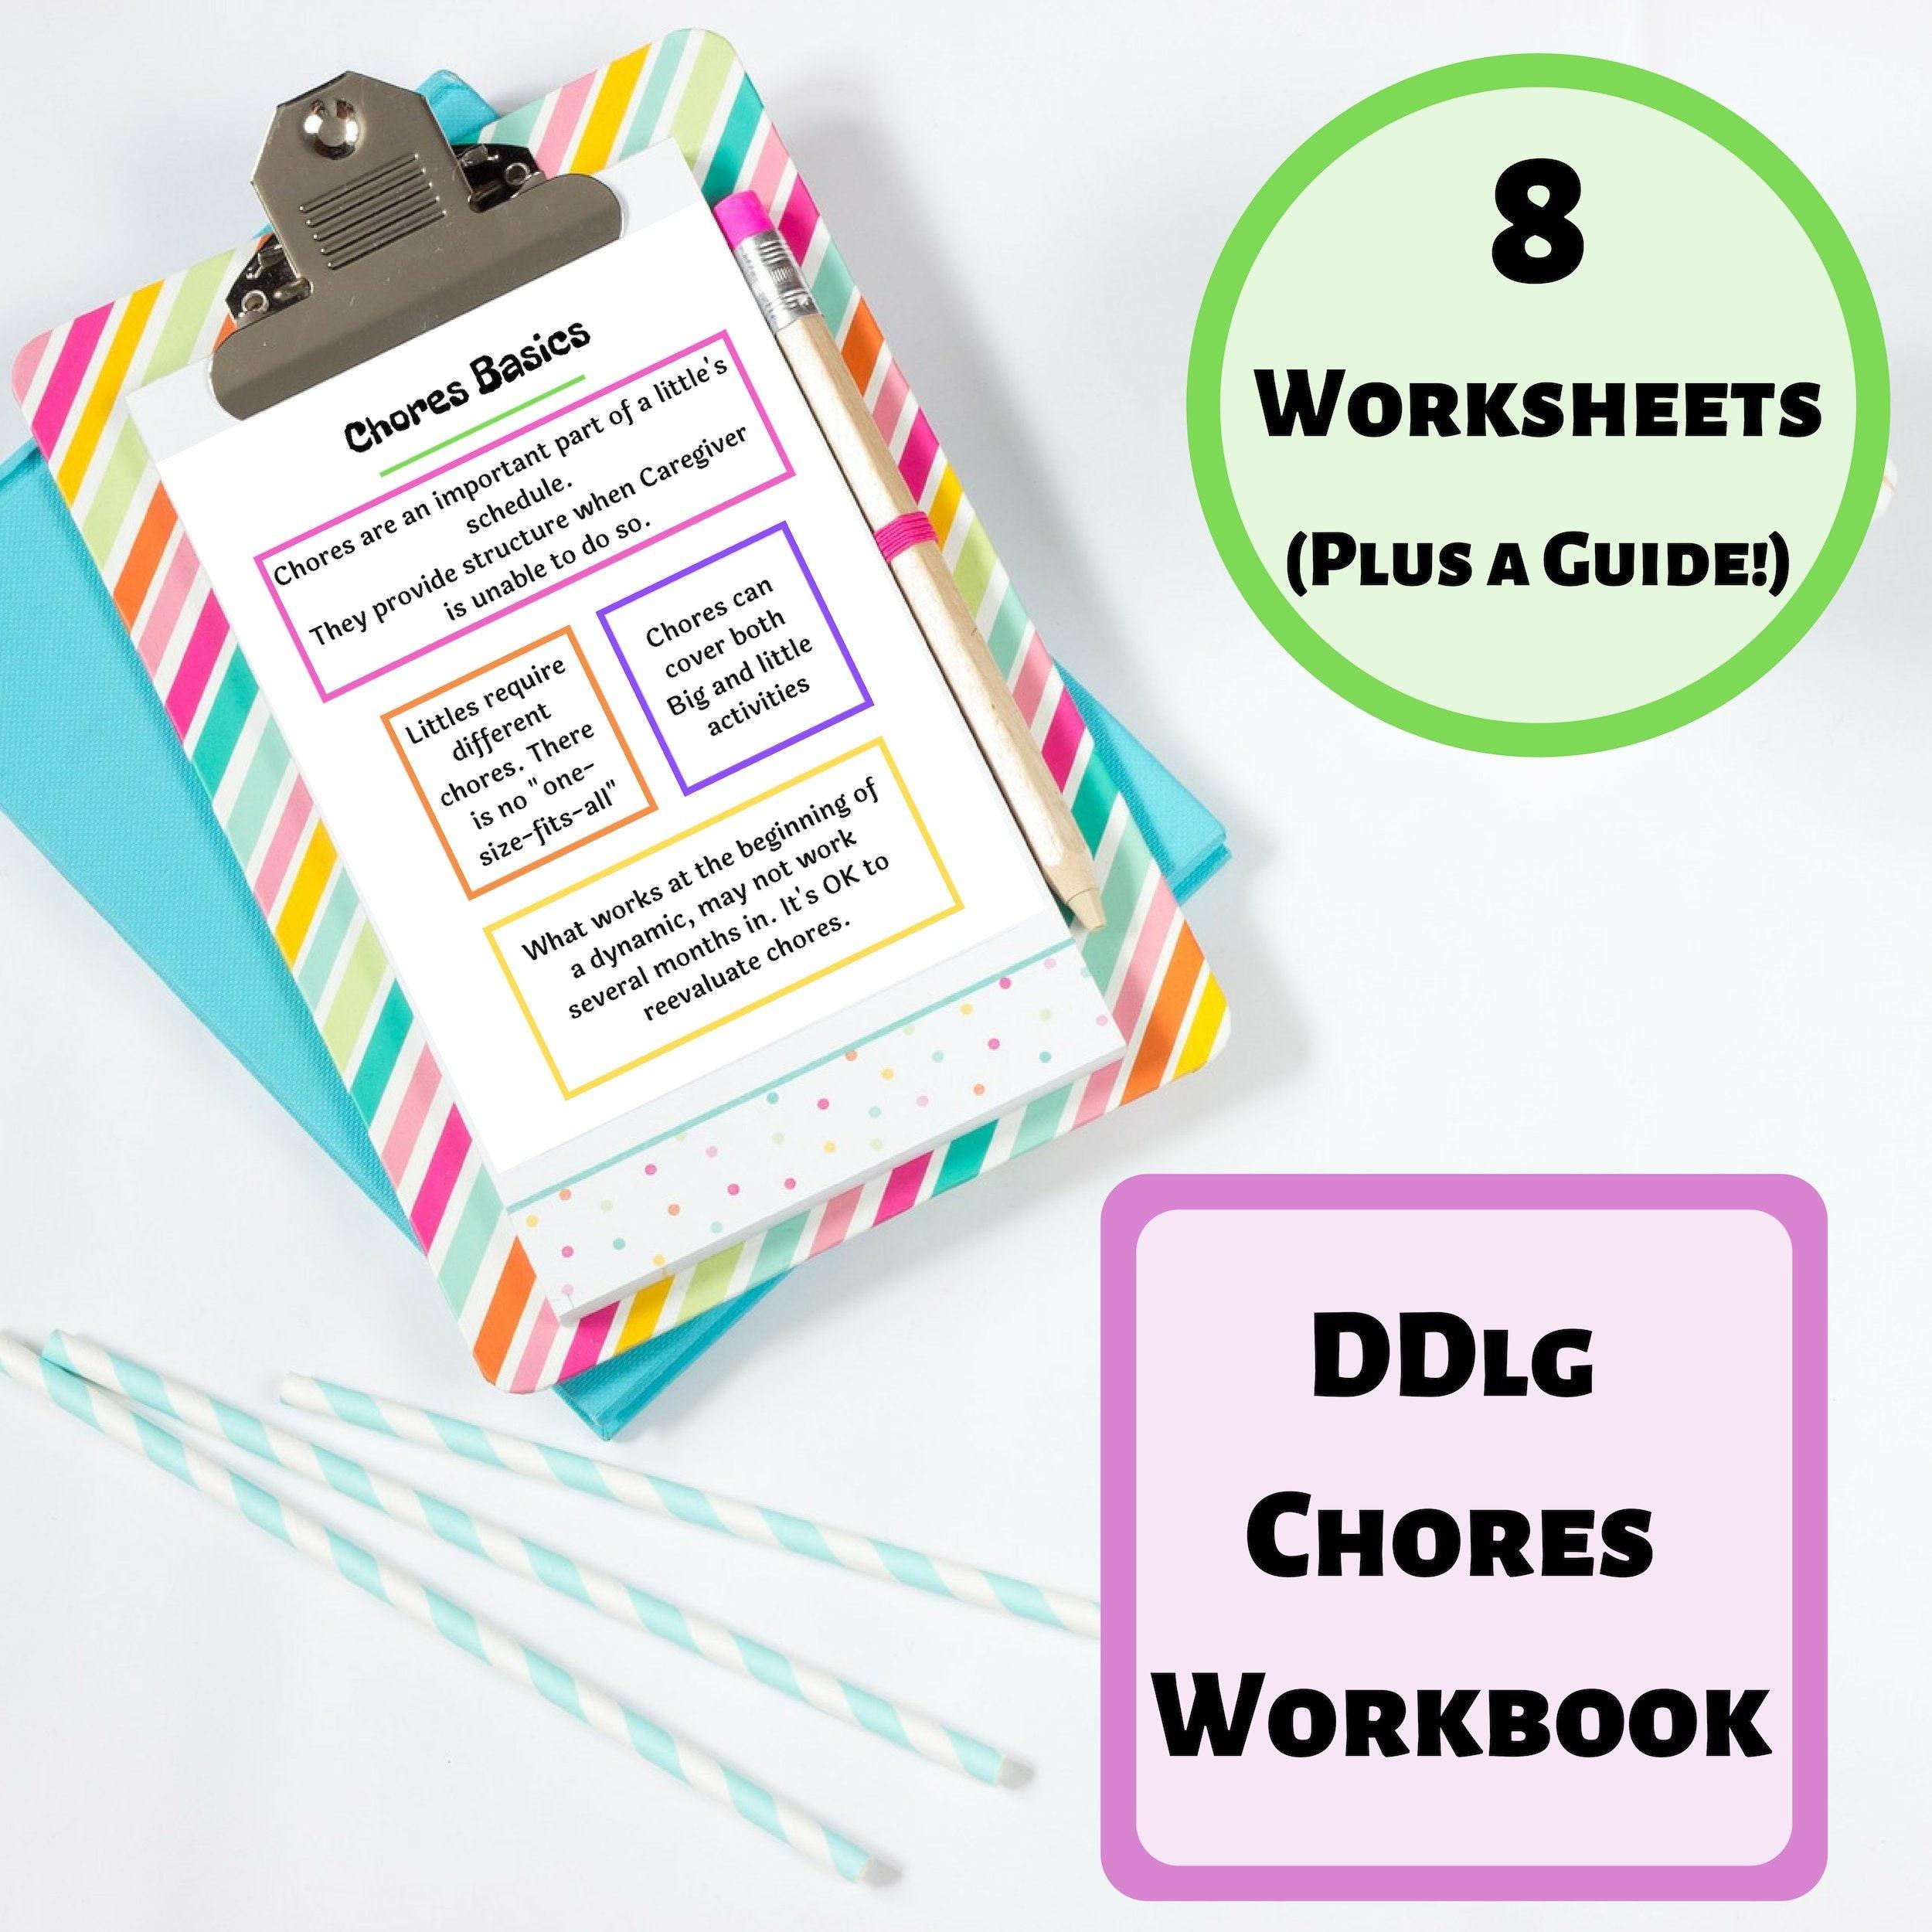 Printable Chores Workbook for CGl Dynamics | Little Space Printable Reward  Chart | BDSM Printable for Daddy Babygirl